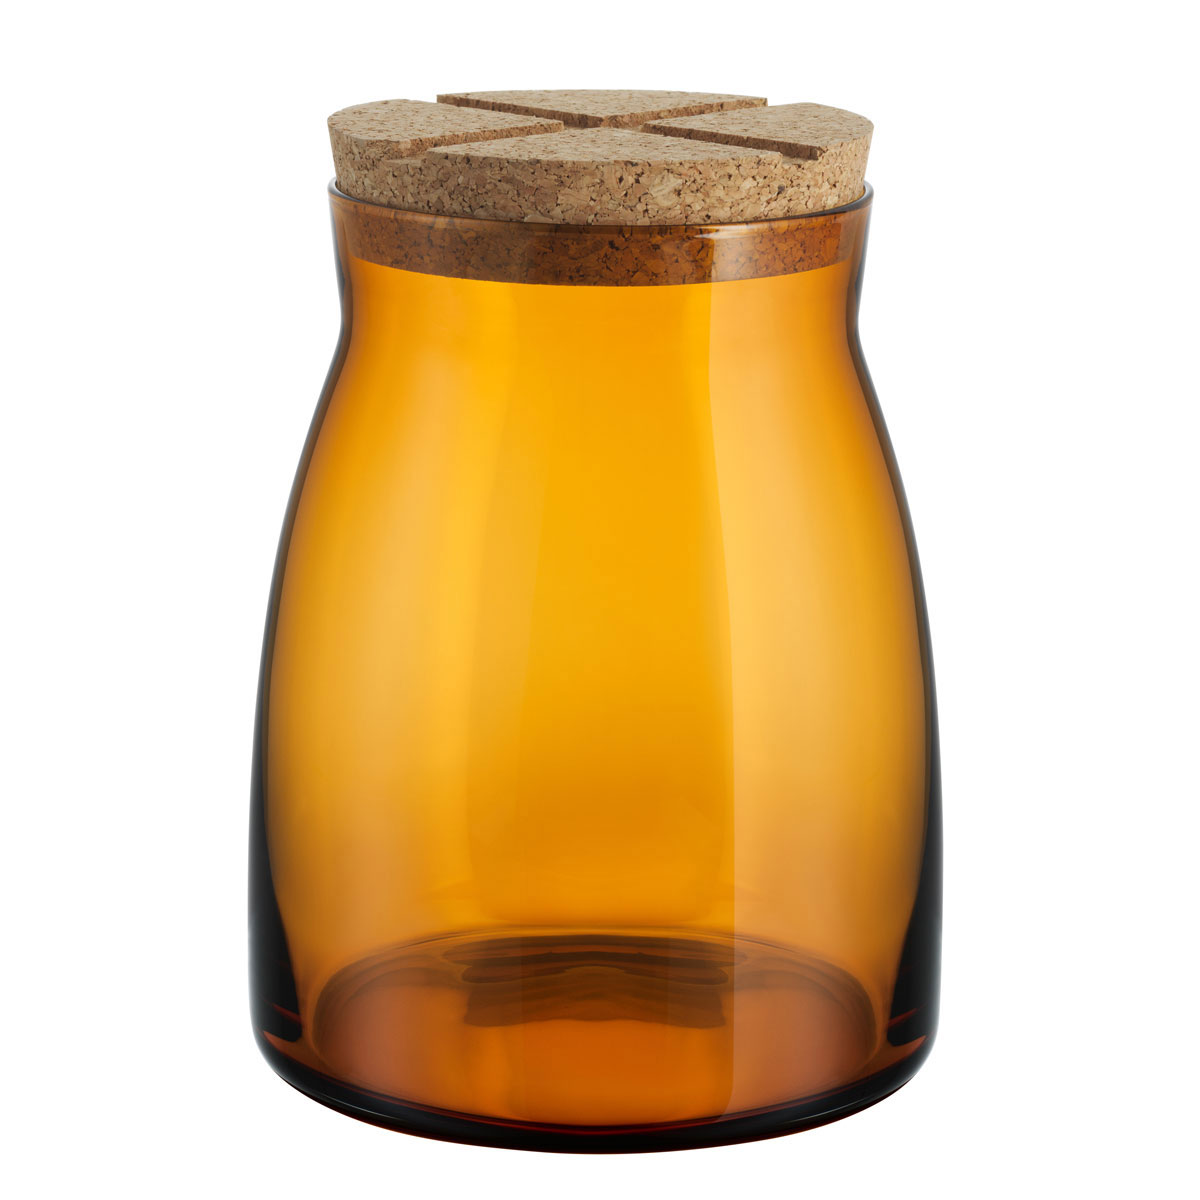 Kosta Boda Bruk Jar with Cork Amber, Large